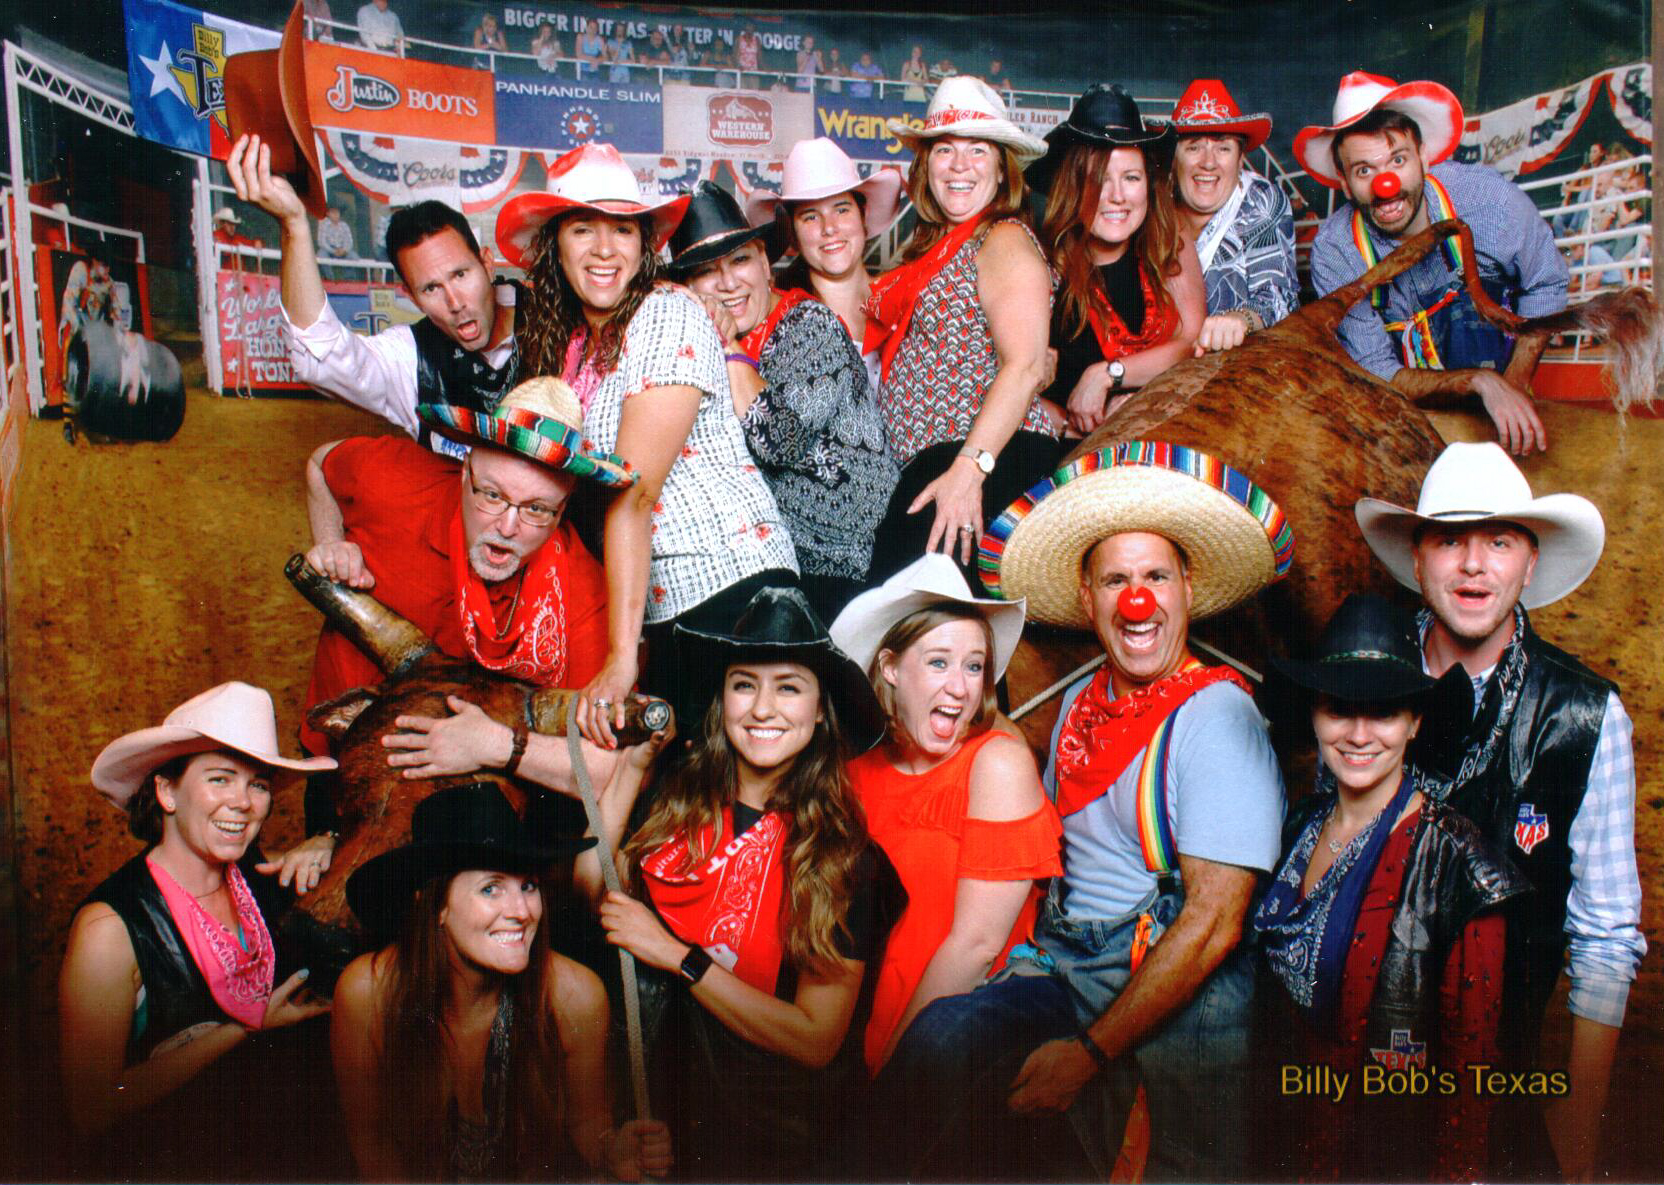 FPG Billy Bob's Texas.jpg